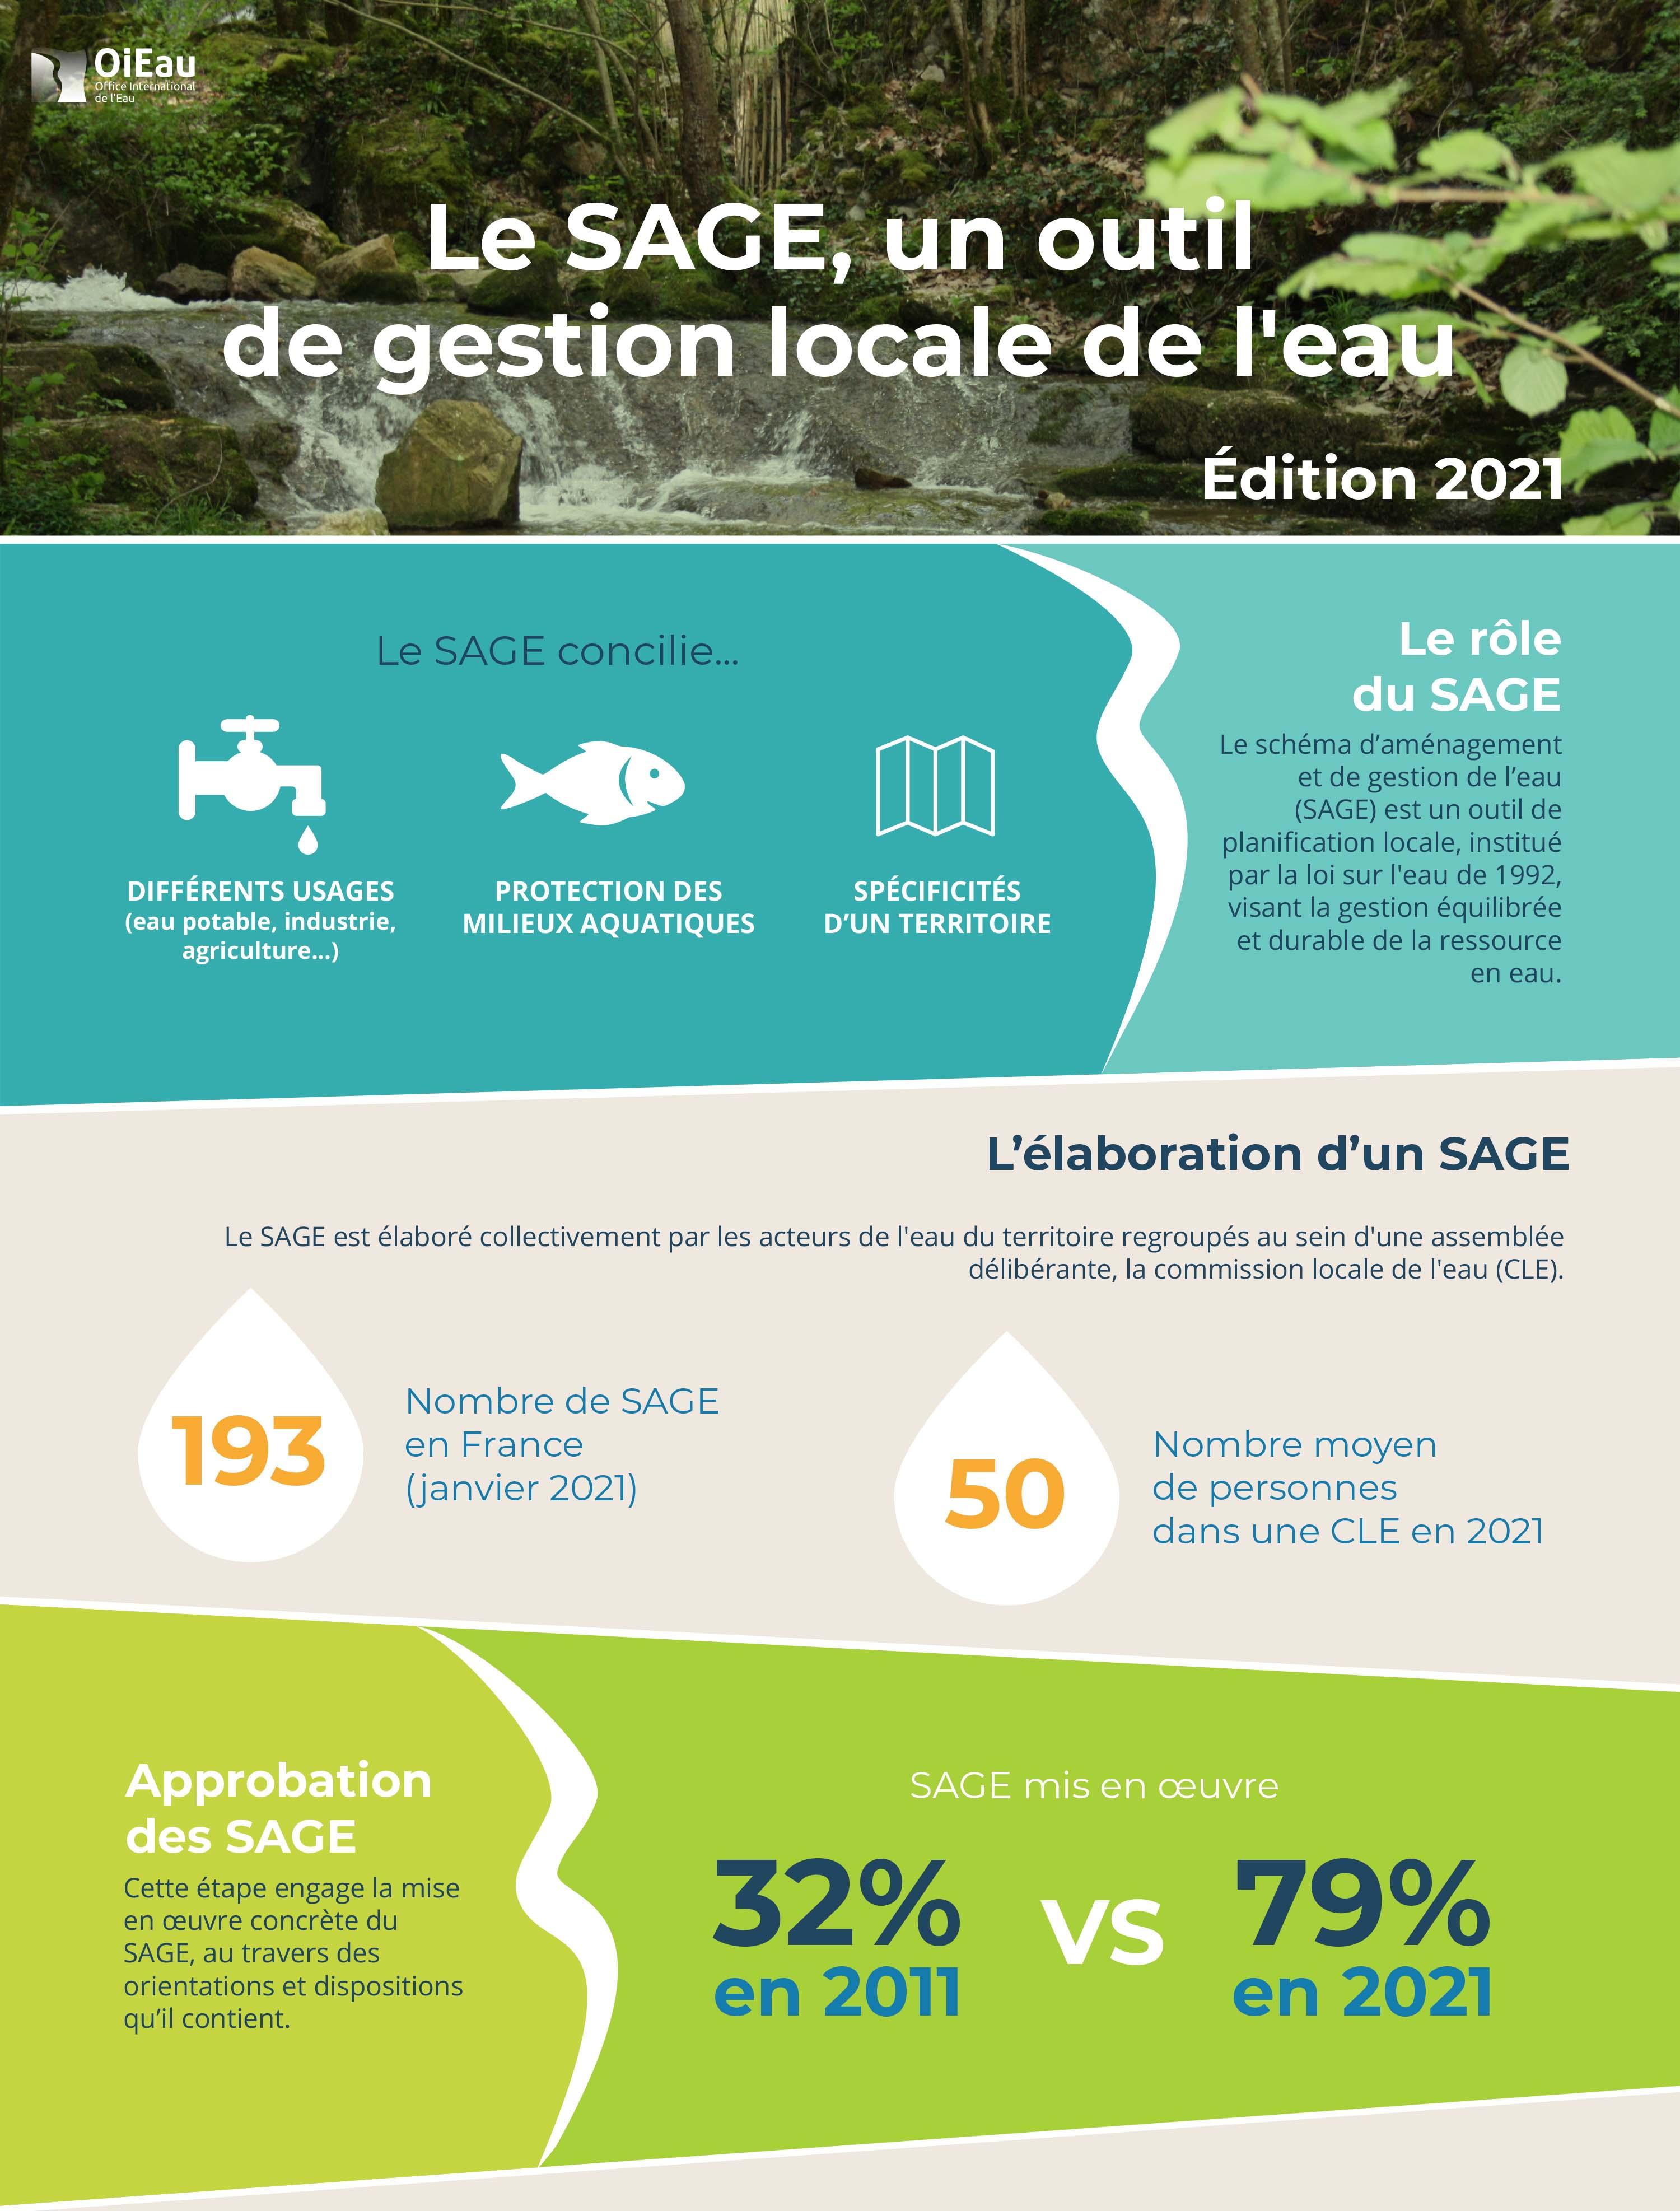 Infographie SAGE 2021 - © OiEau